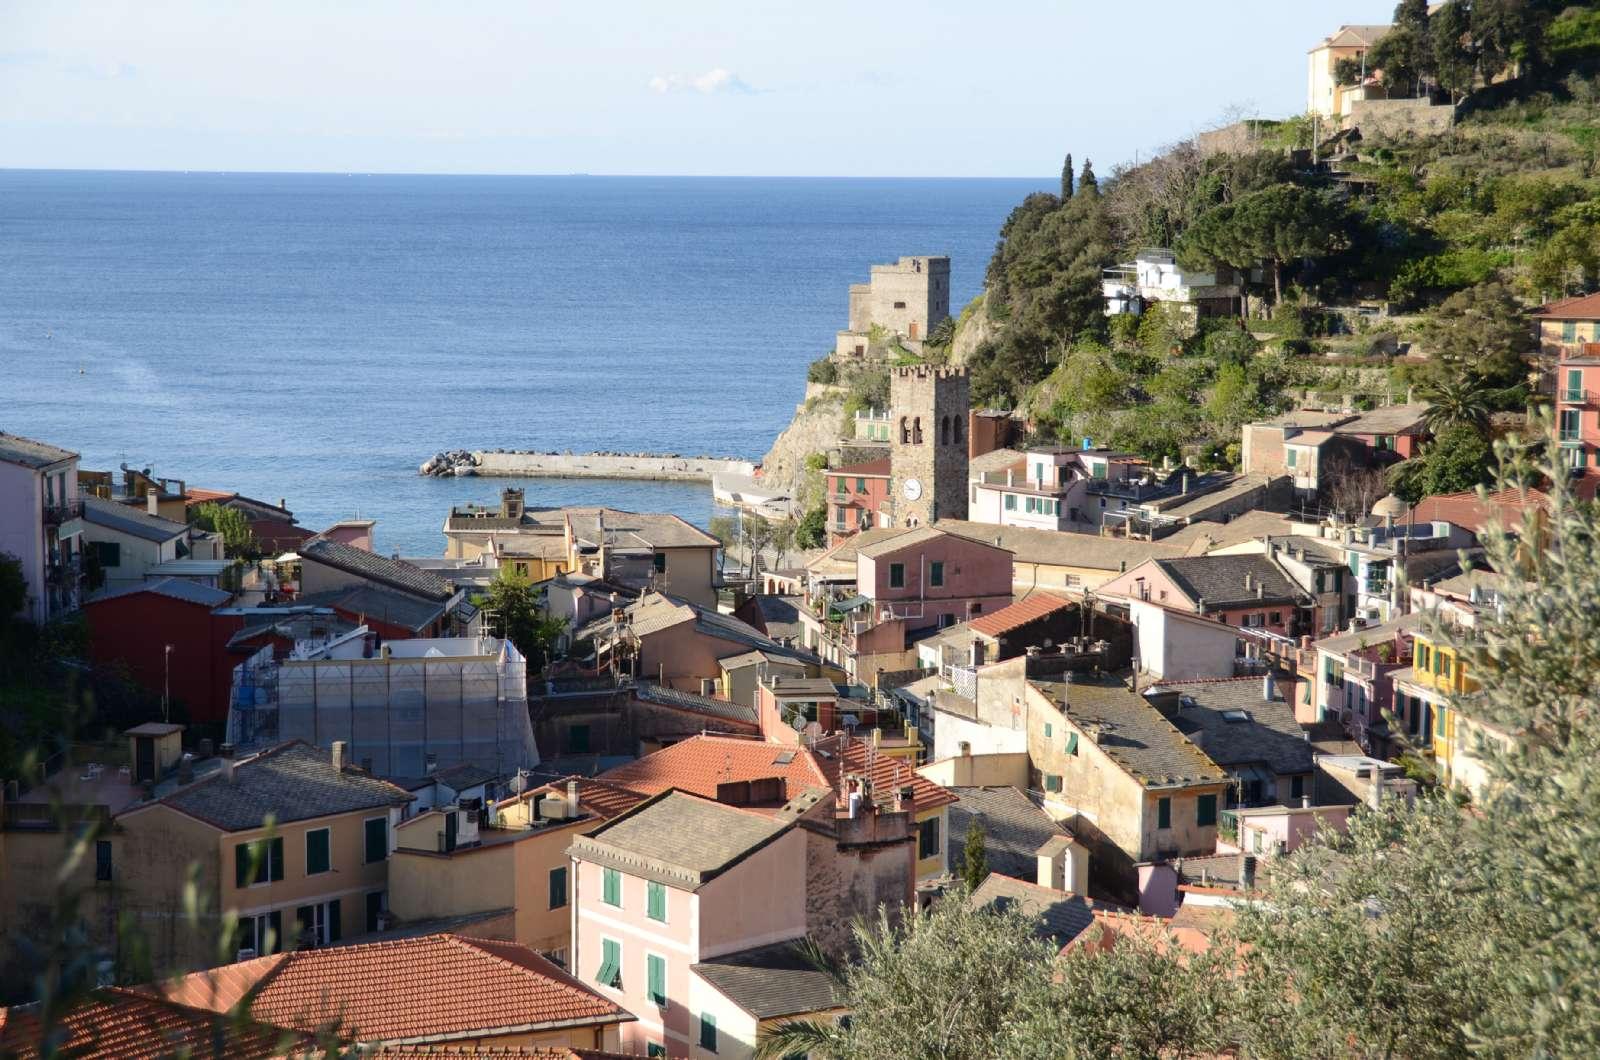 Monterossos karakteristiske profil med det historiske tårn